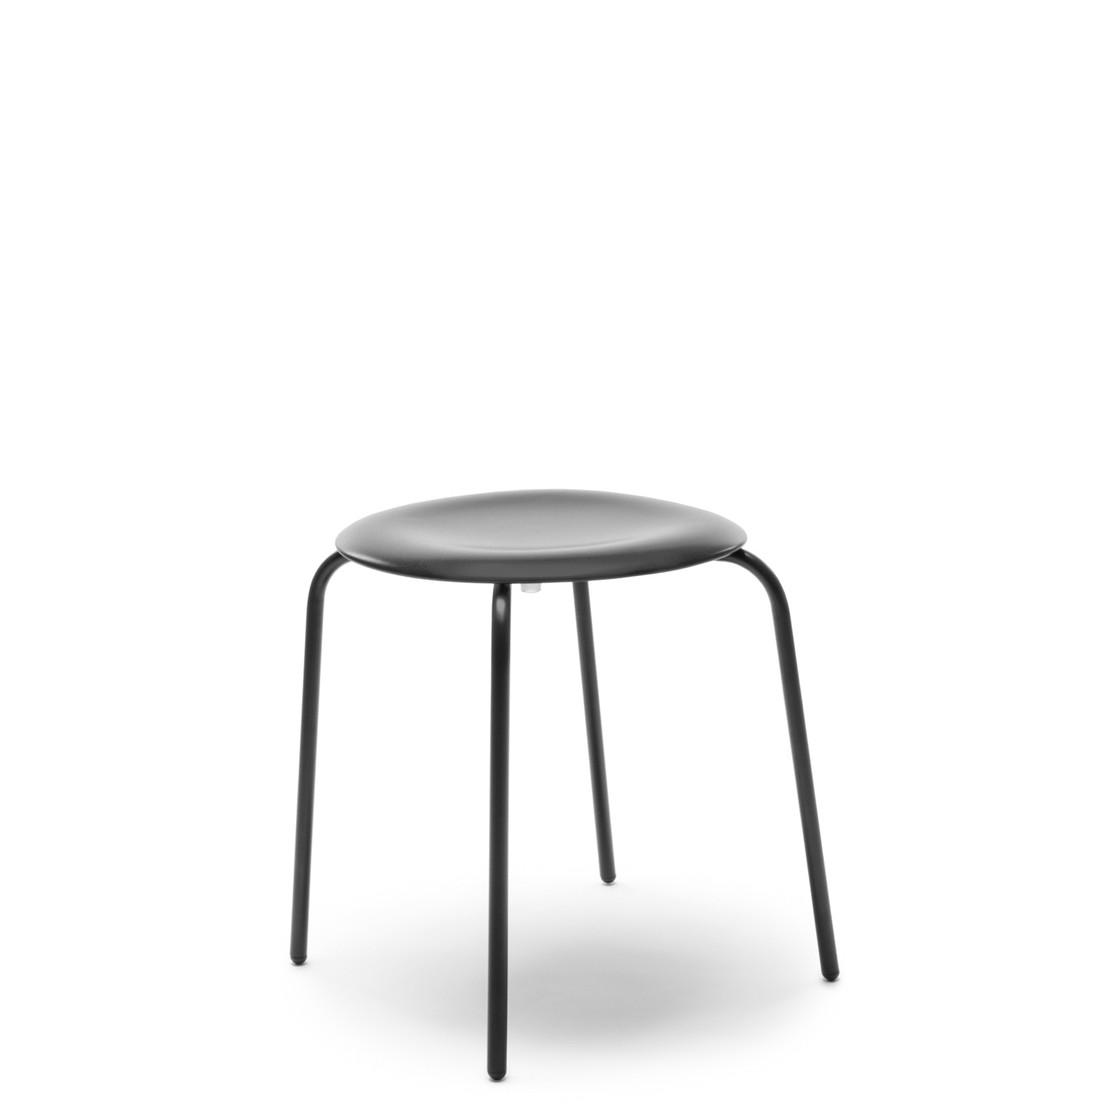 pro stool vierbeingestell niedrig fl totto shop. Black Bedroom Furniture Sets. Home Design Ideas